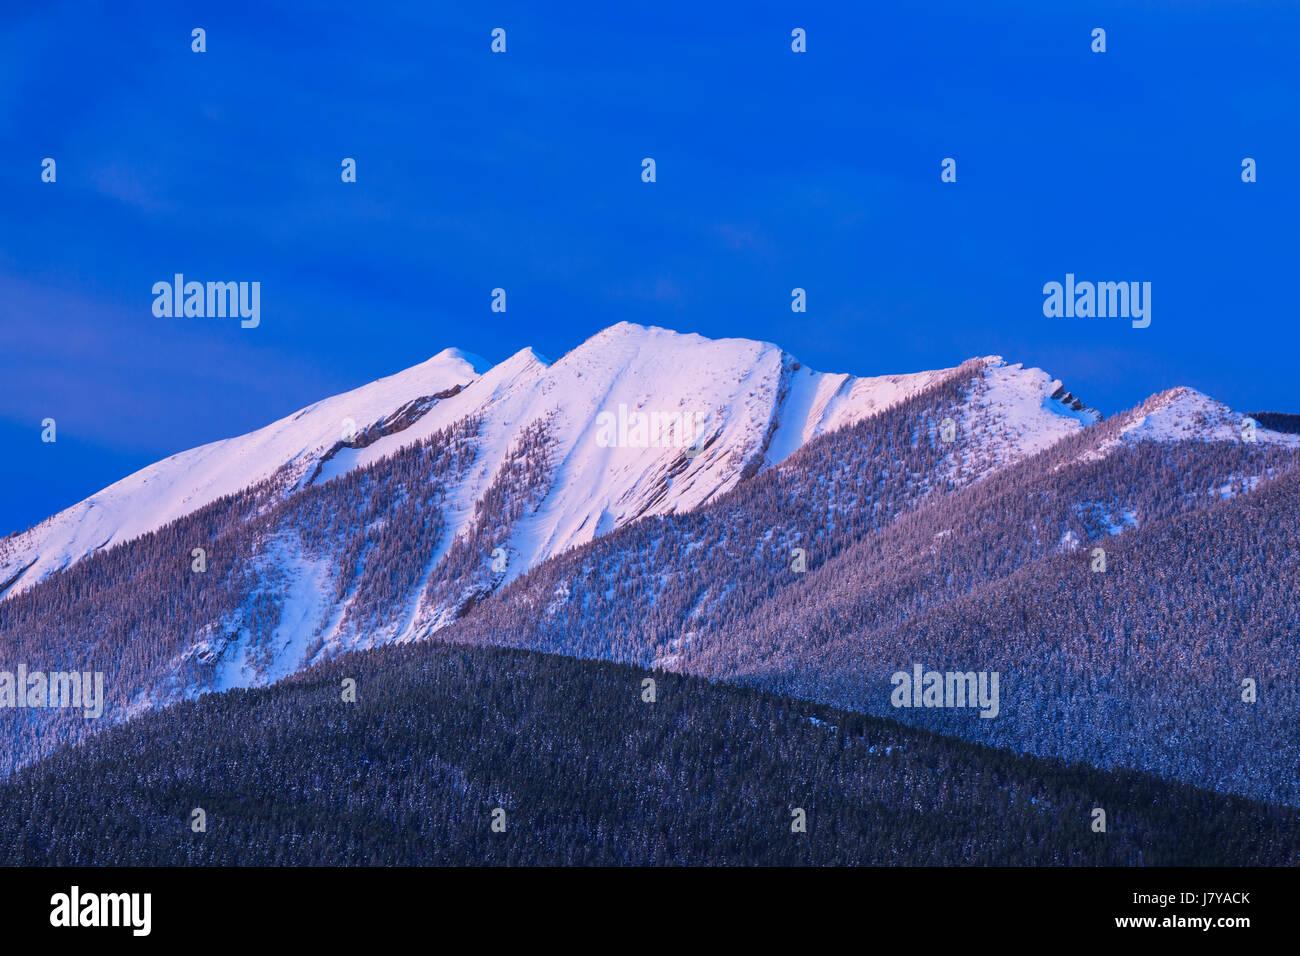 morning light on shell mountain in the absaroka range near livingston, montana - Stock Image